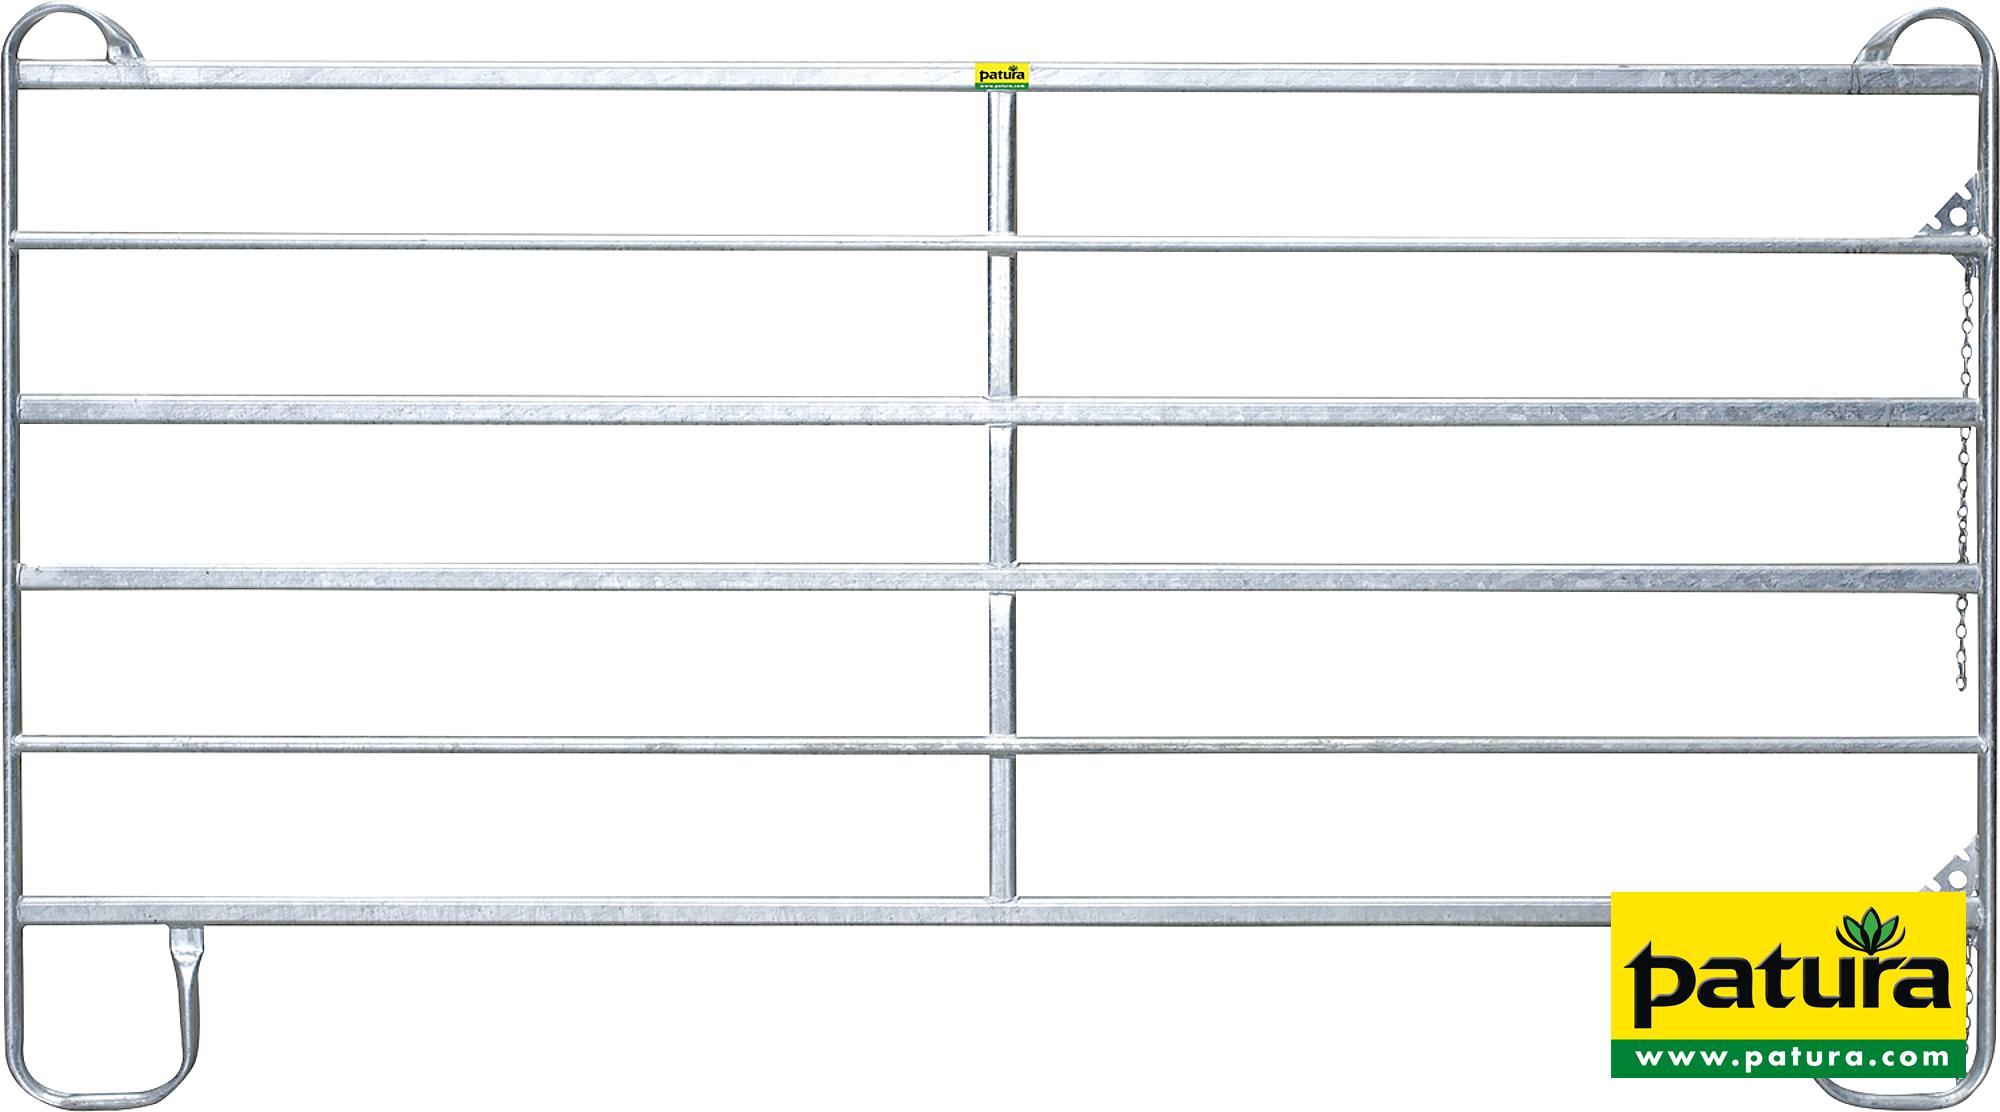 Panel-6, Länge 2,40 m, Höhe 1,70 m (1 Mittelstrebe)